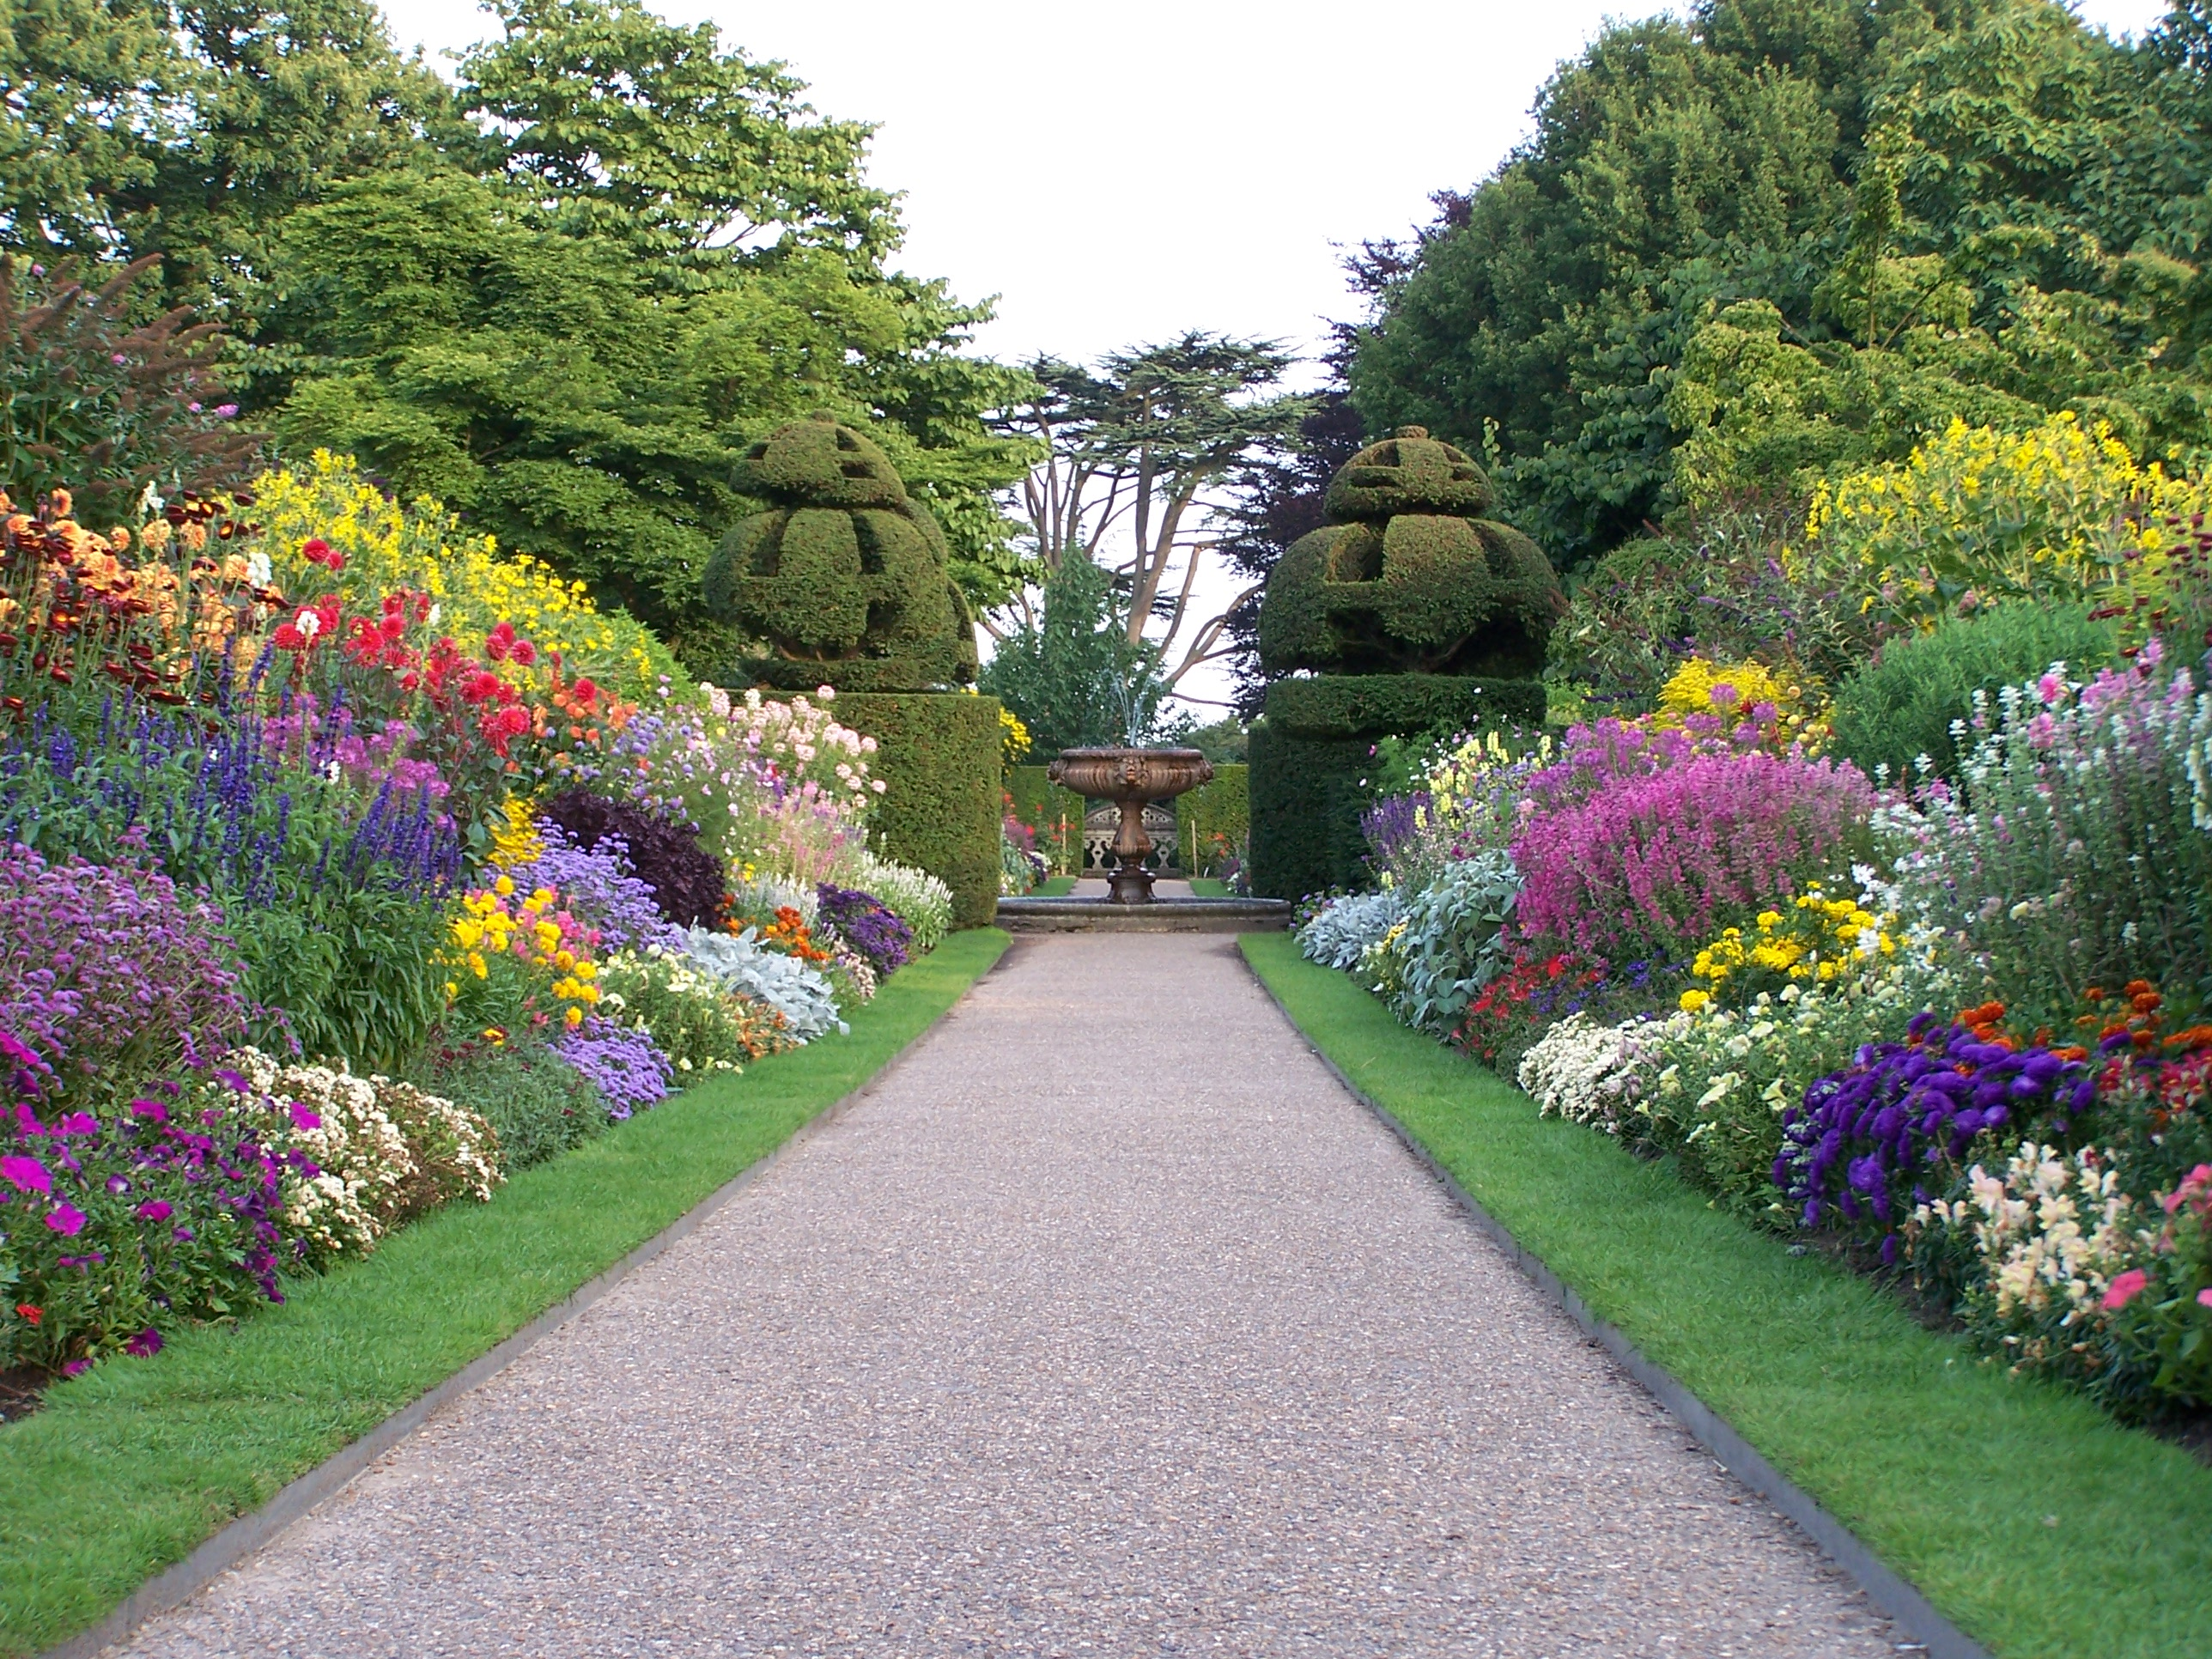 Nymans viaje a visitar jardines ingleses for Arboles para jardin